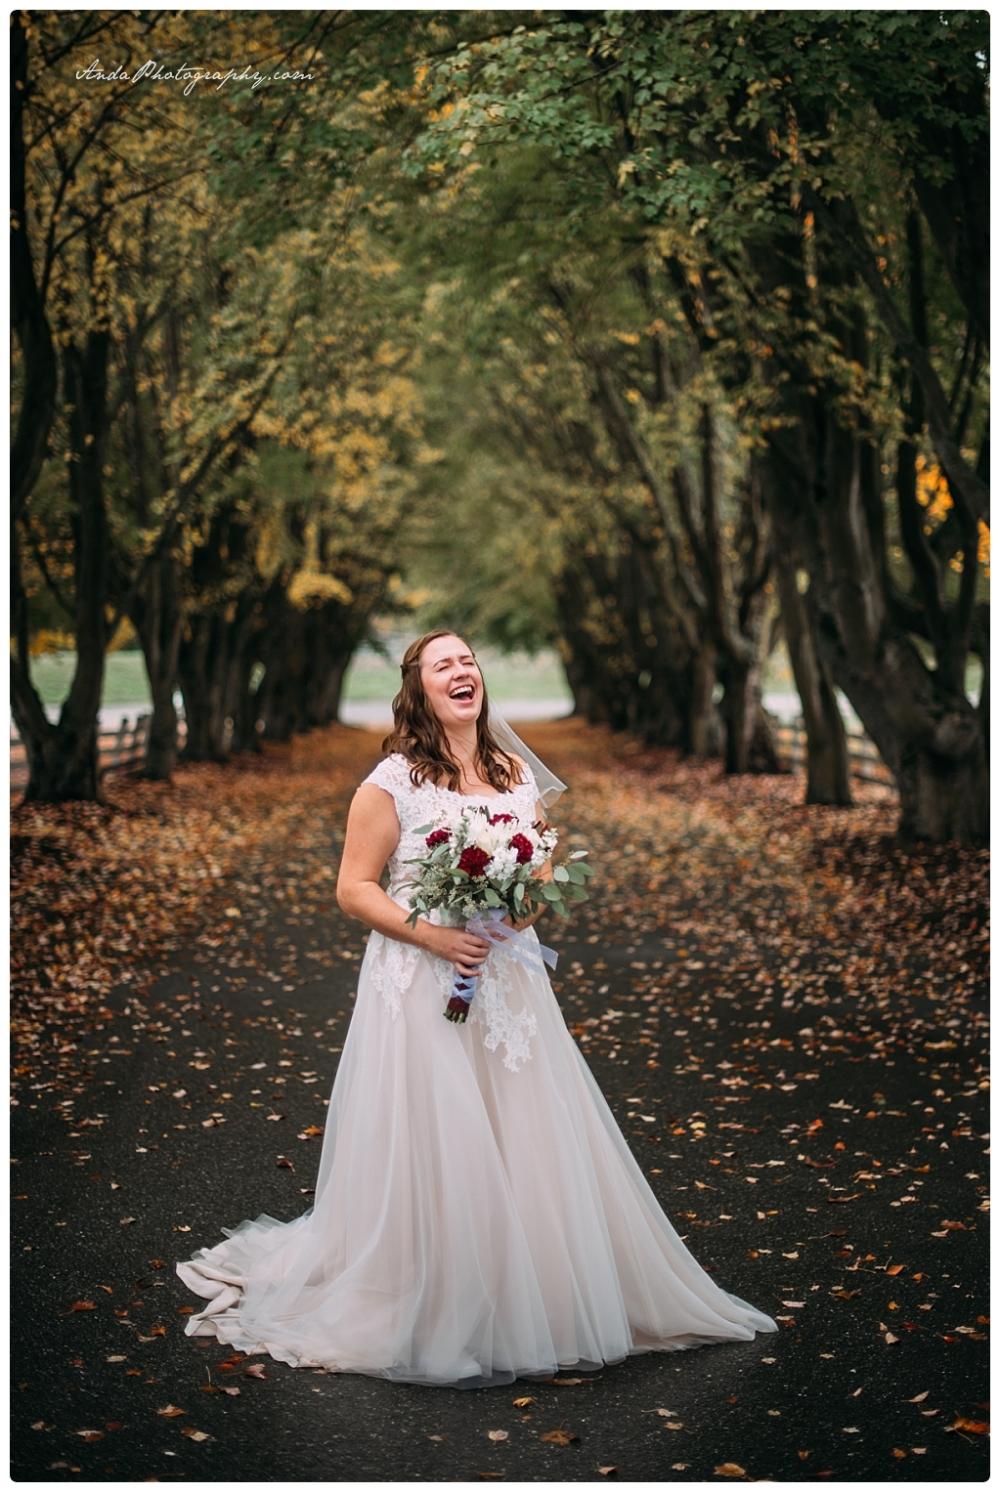 Anda Photography Bellingham wedding photography Bellingham lifestyle wedding photographer Maplehurst Farms_0069a